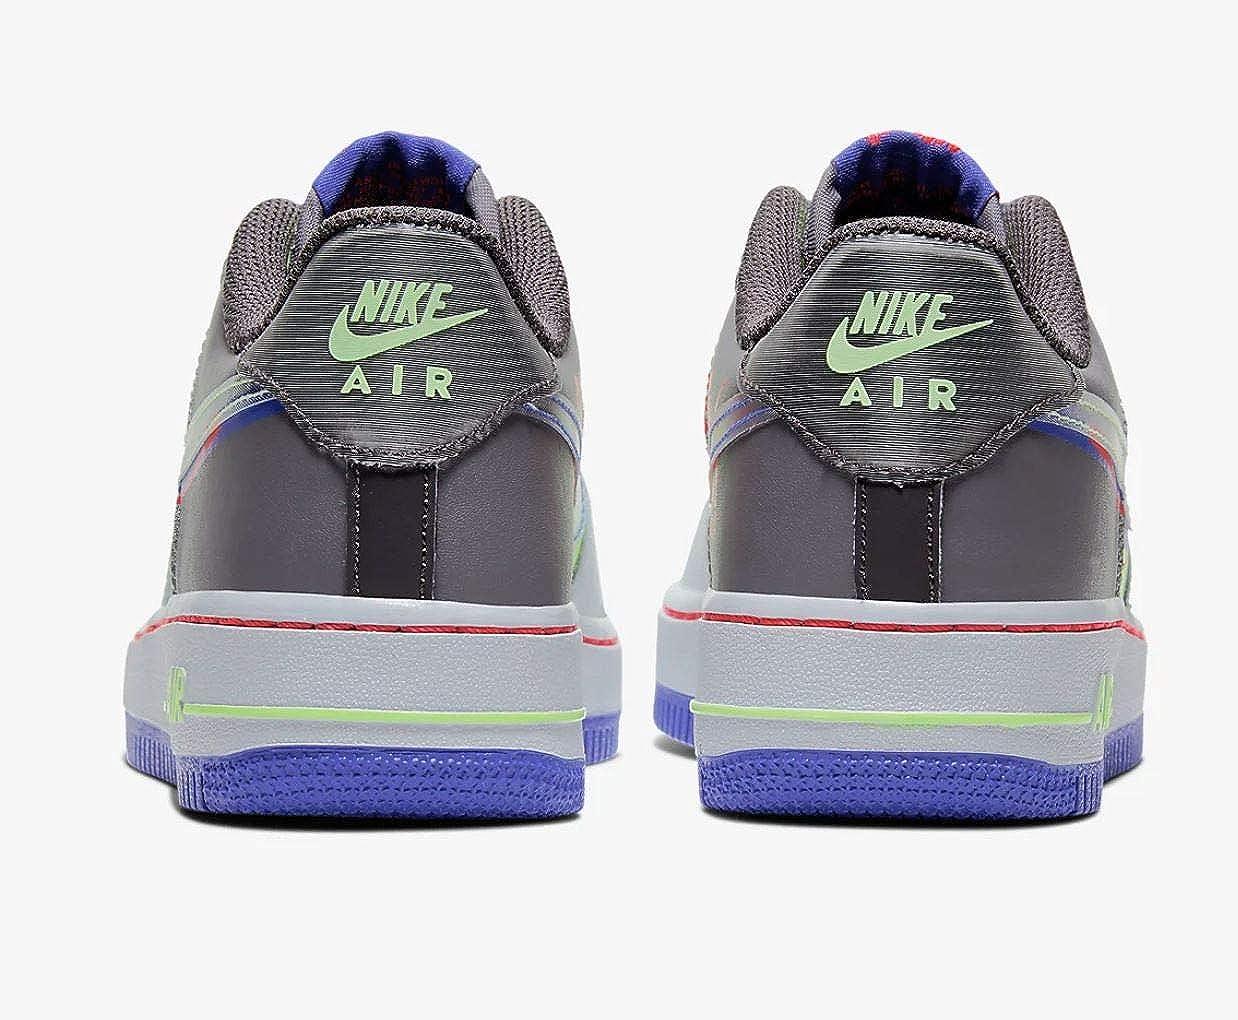 Big Kids Ct1628-001 gs Nike Air Force 1 Lv8